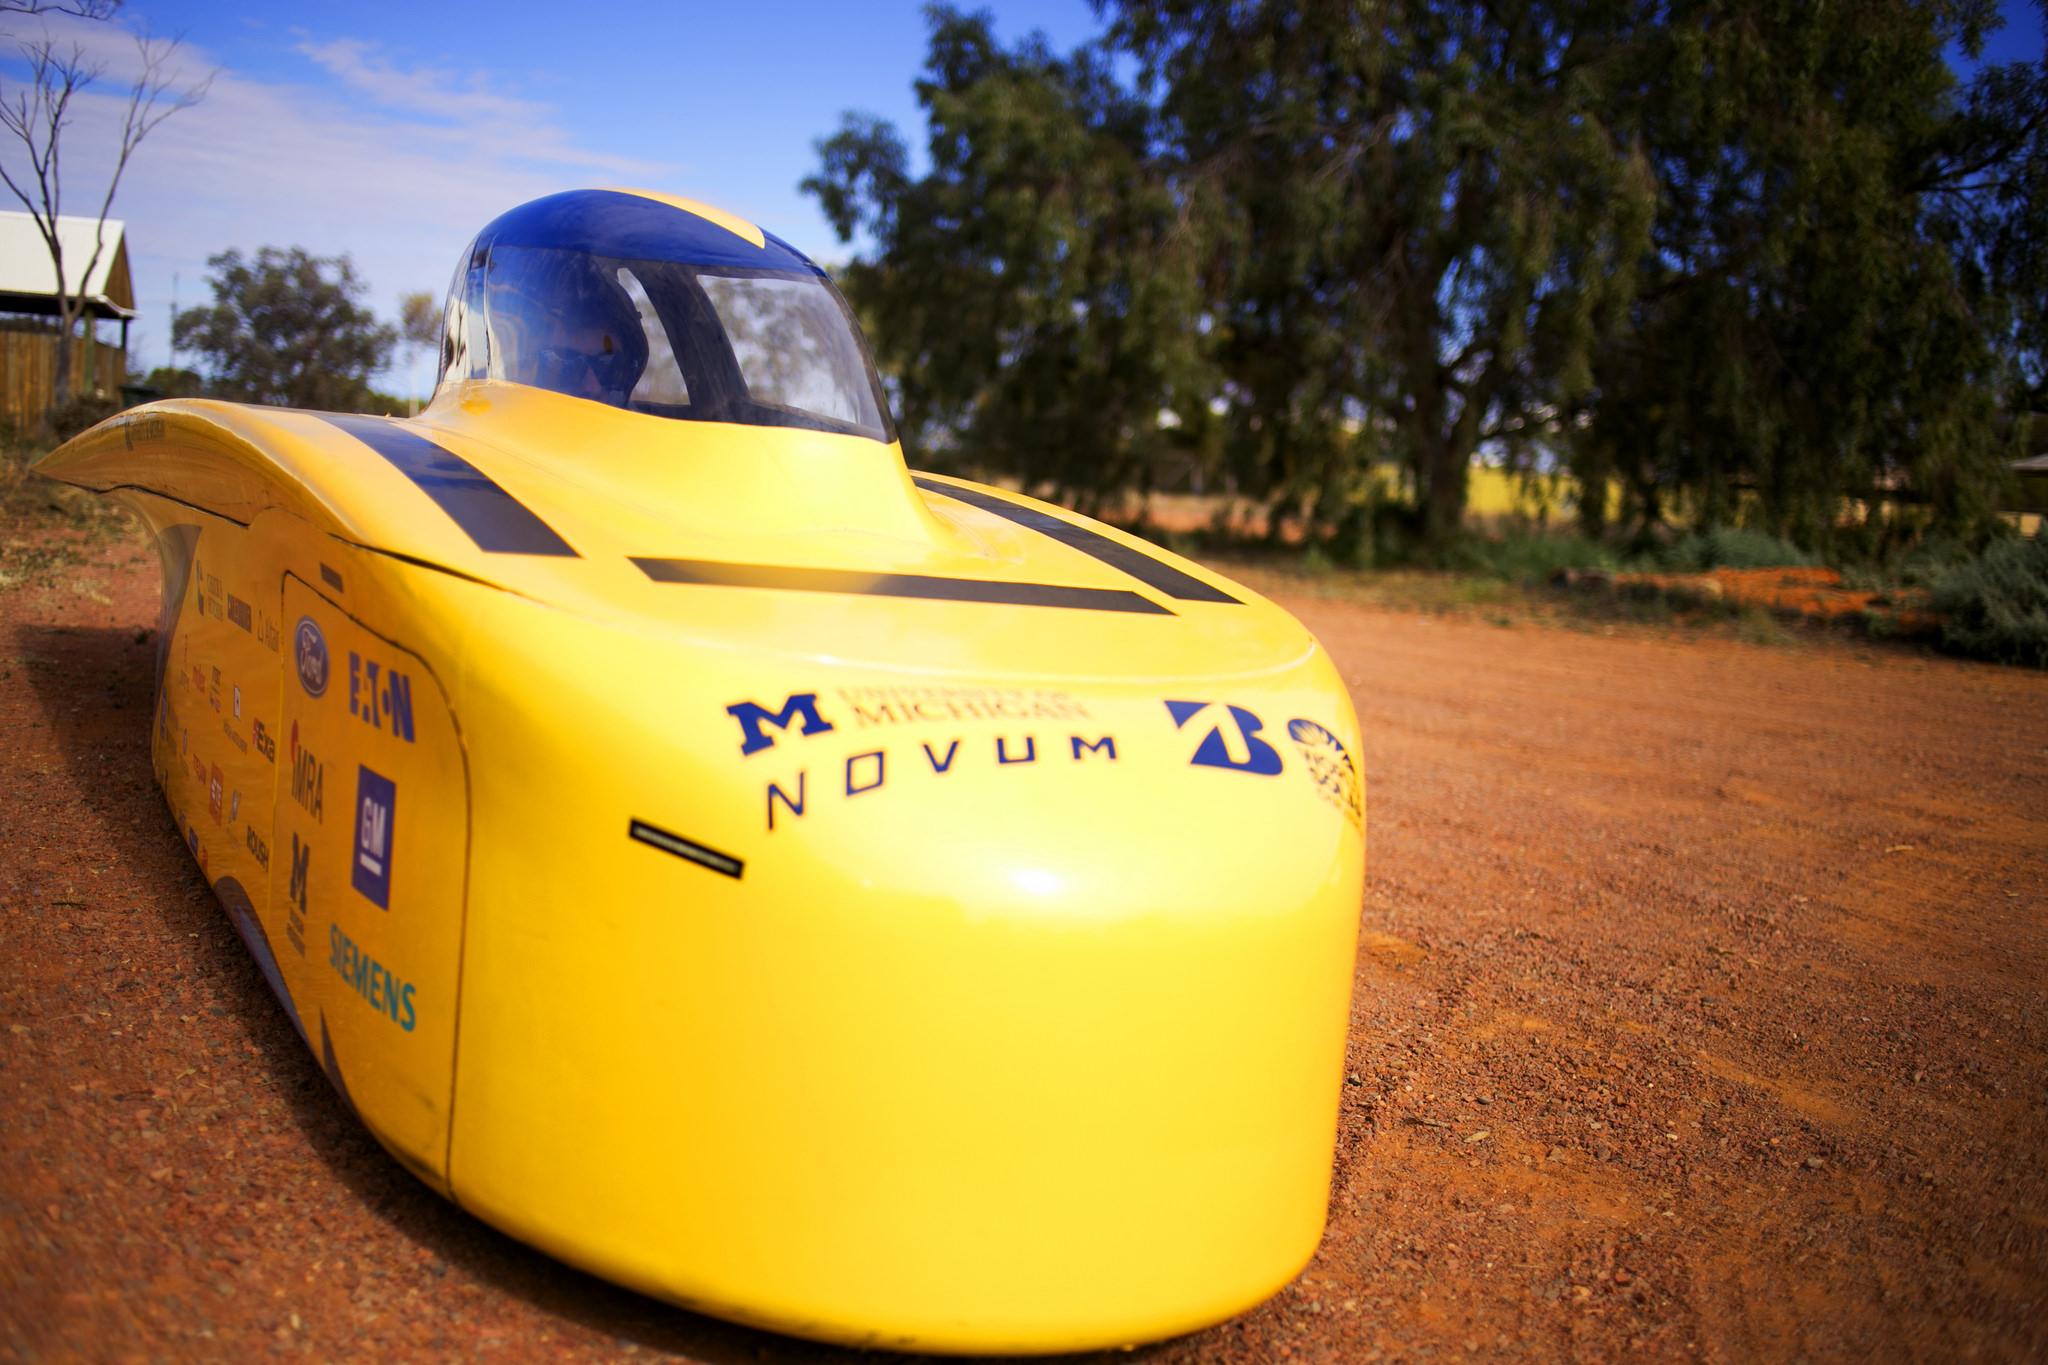 University of Michigan solar racer, dubbed Novum.